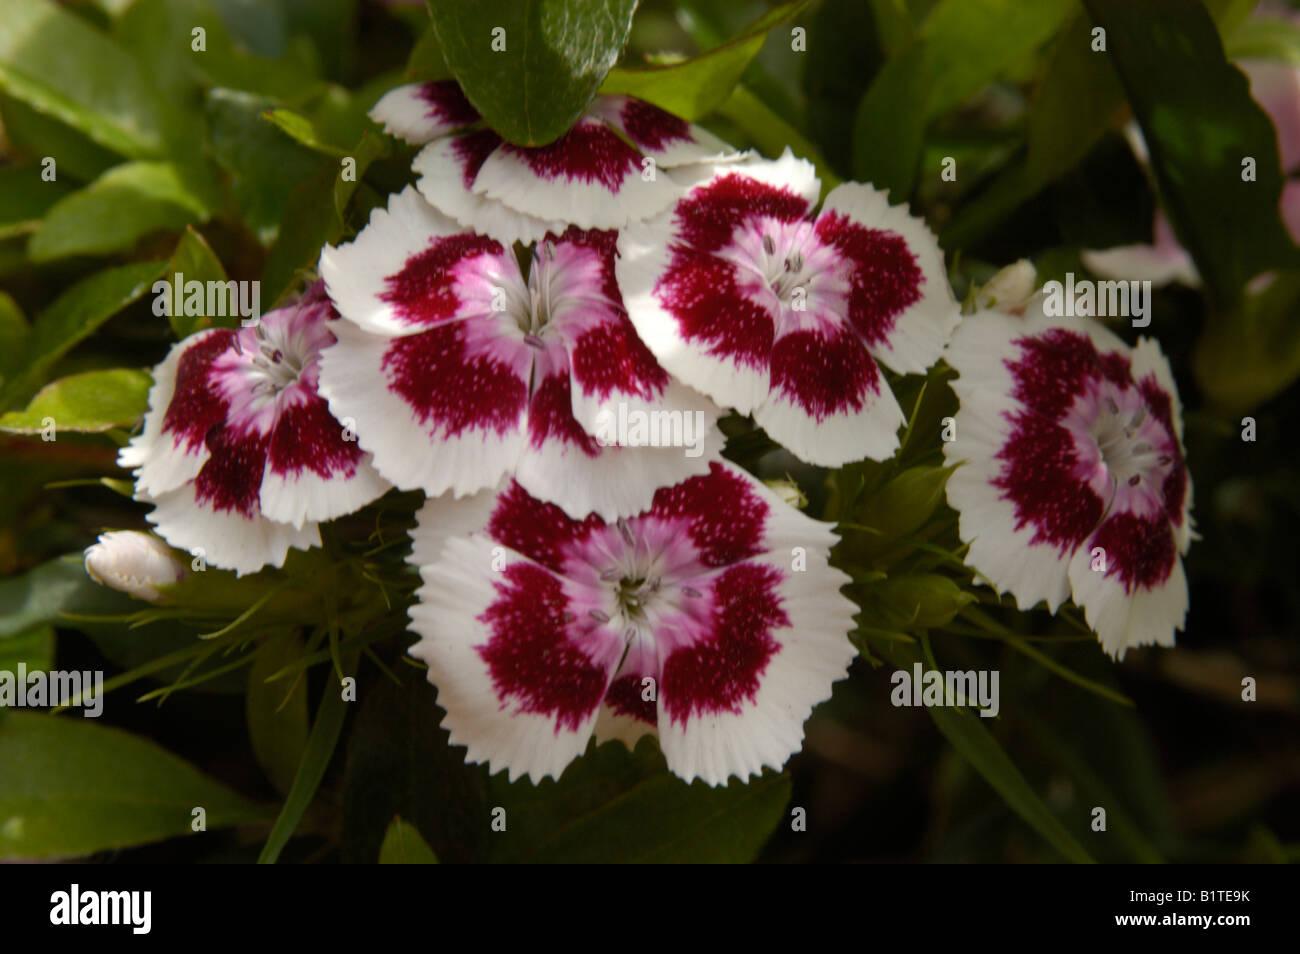 Sweet William Flower - Stock Image